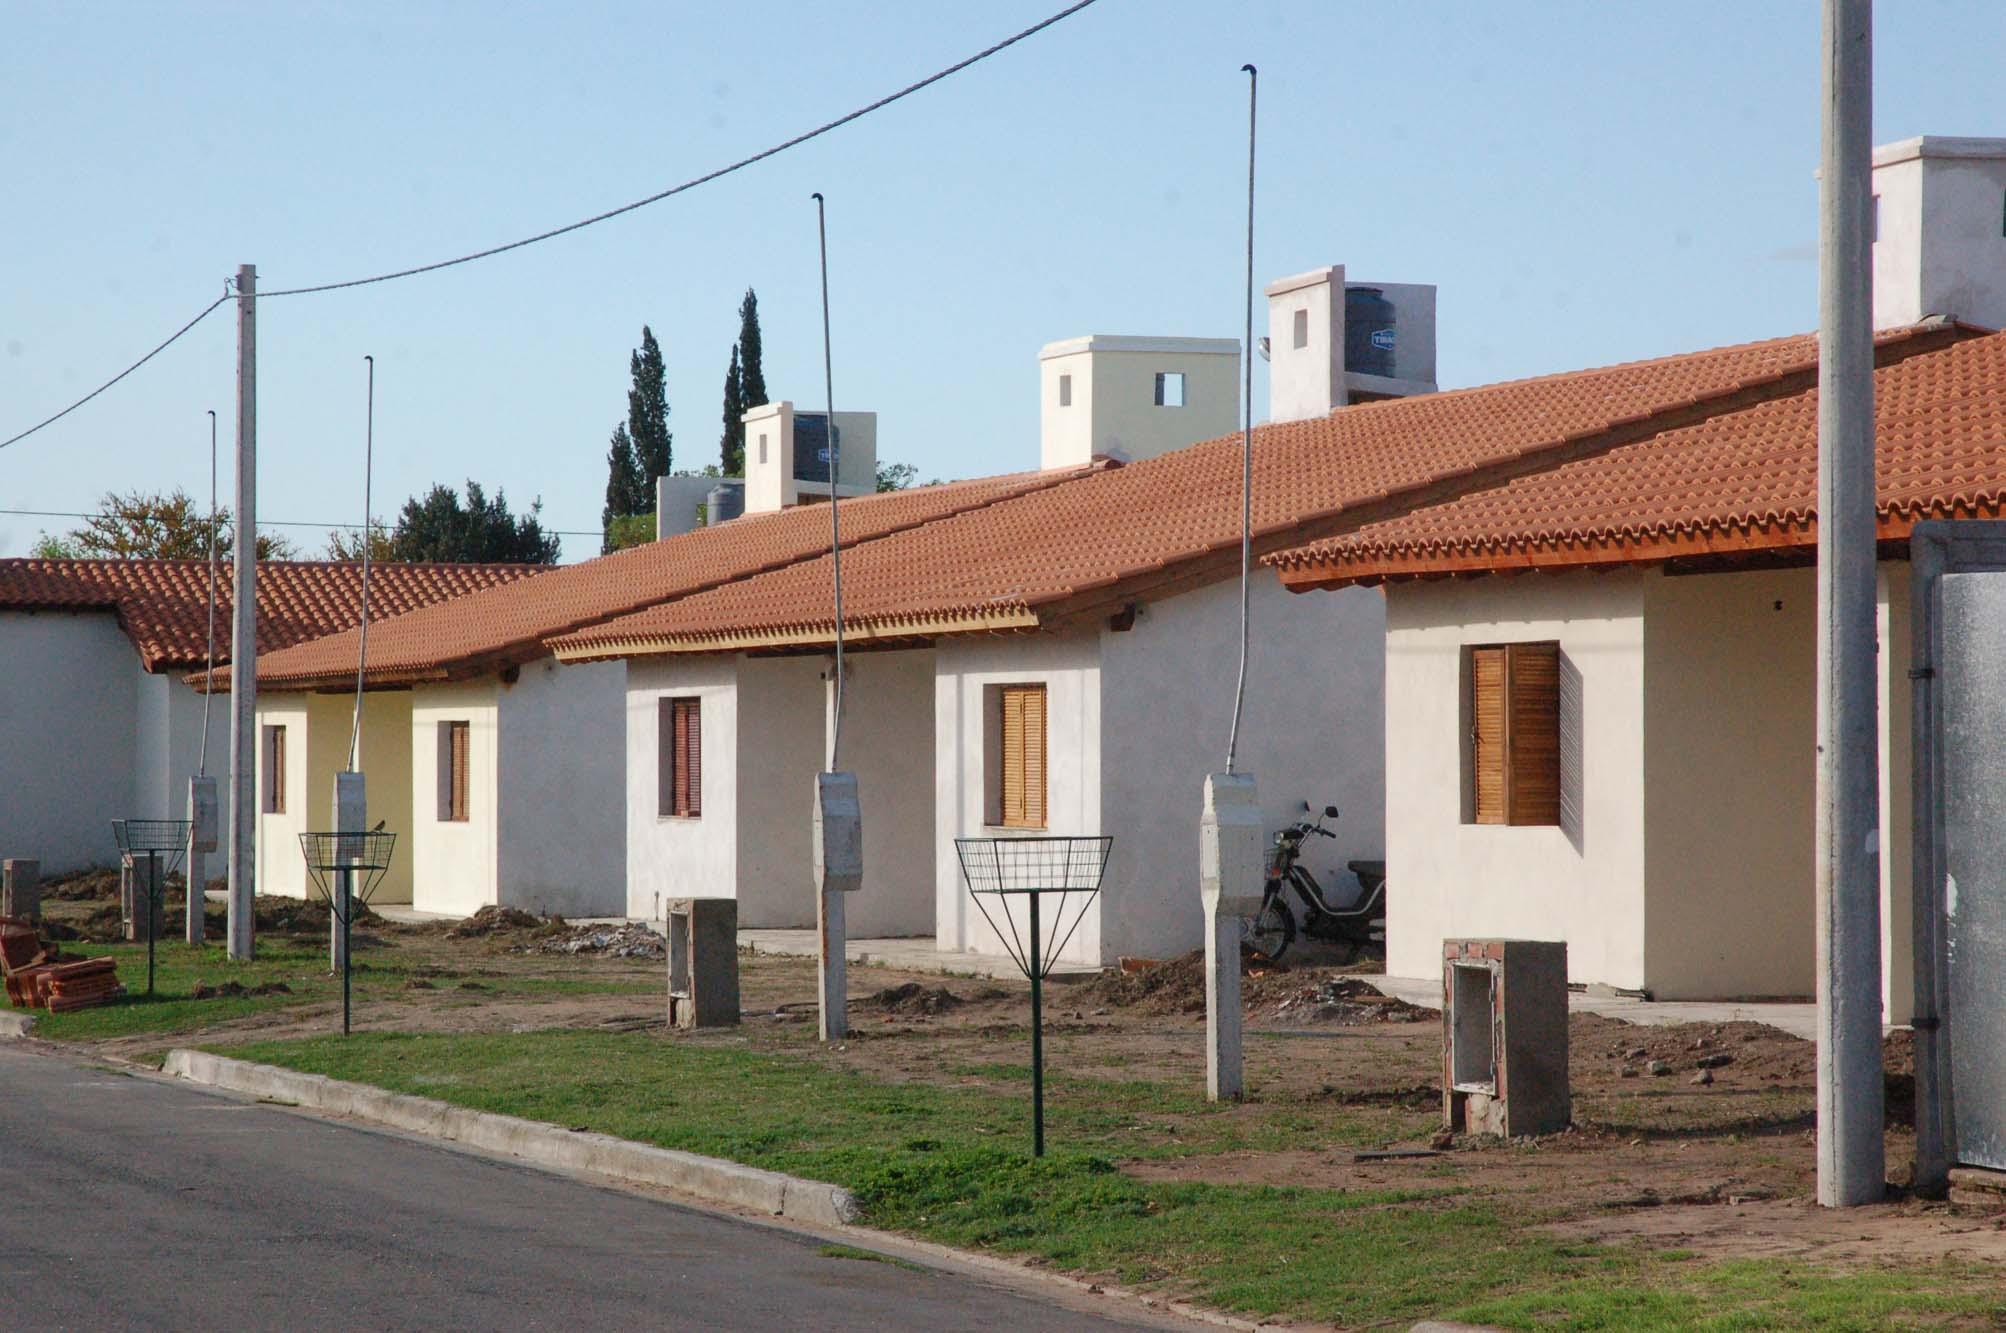 Las 423 viviendas, en marcha